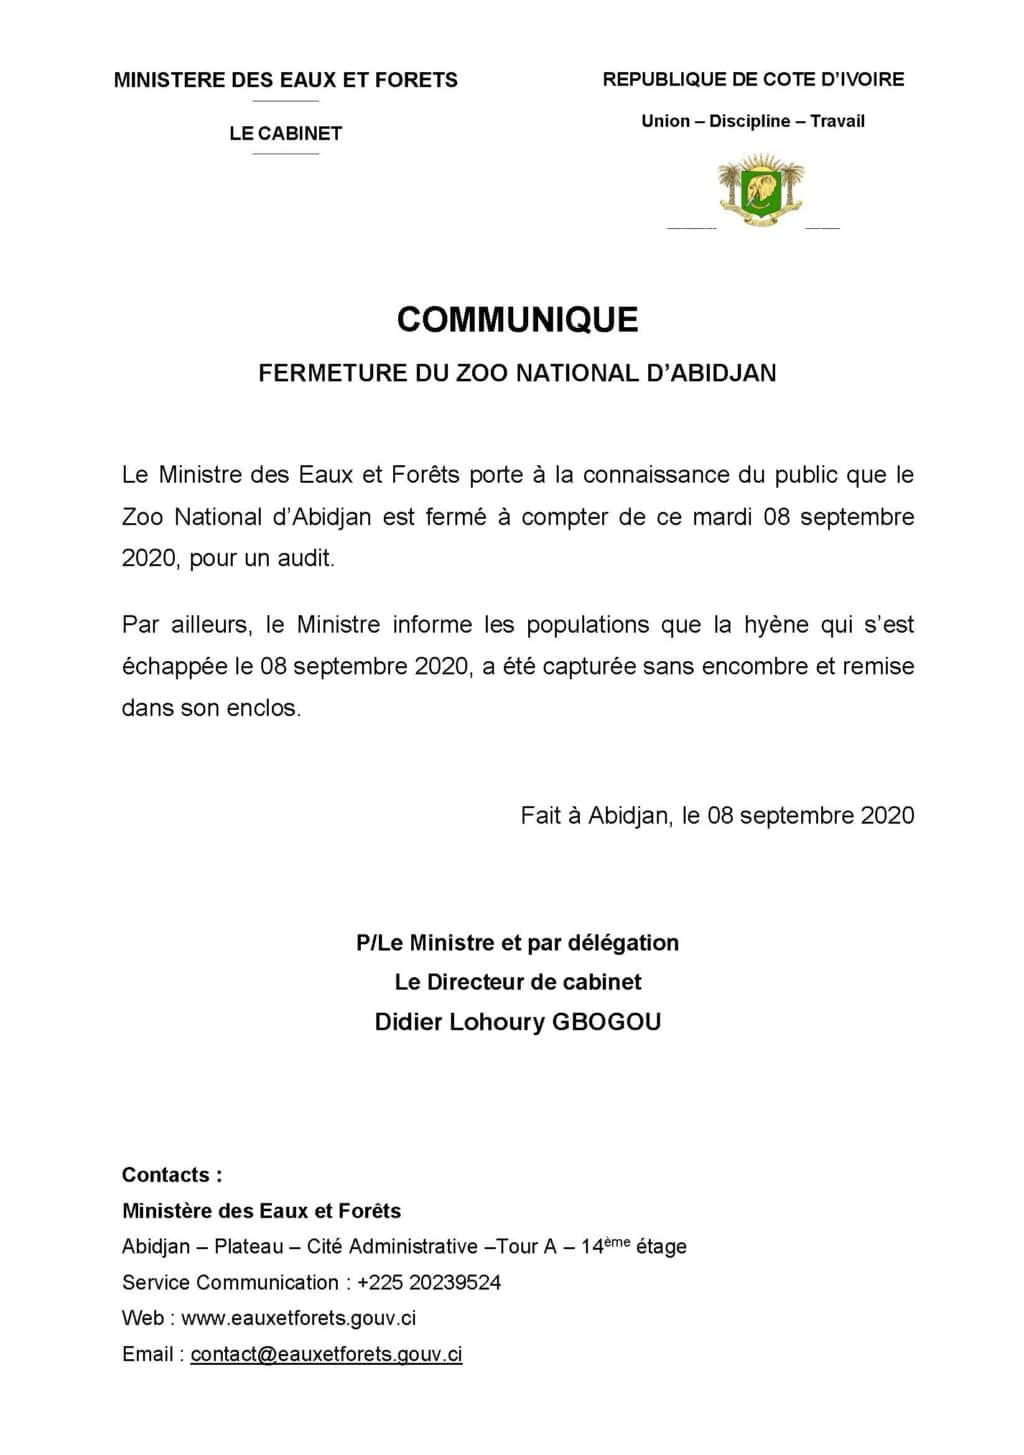 communique_fermeture_zoo